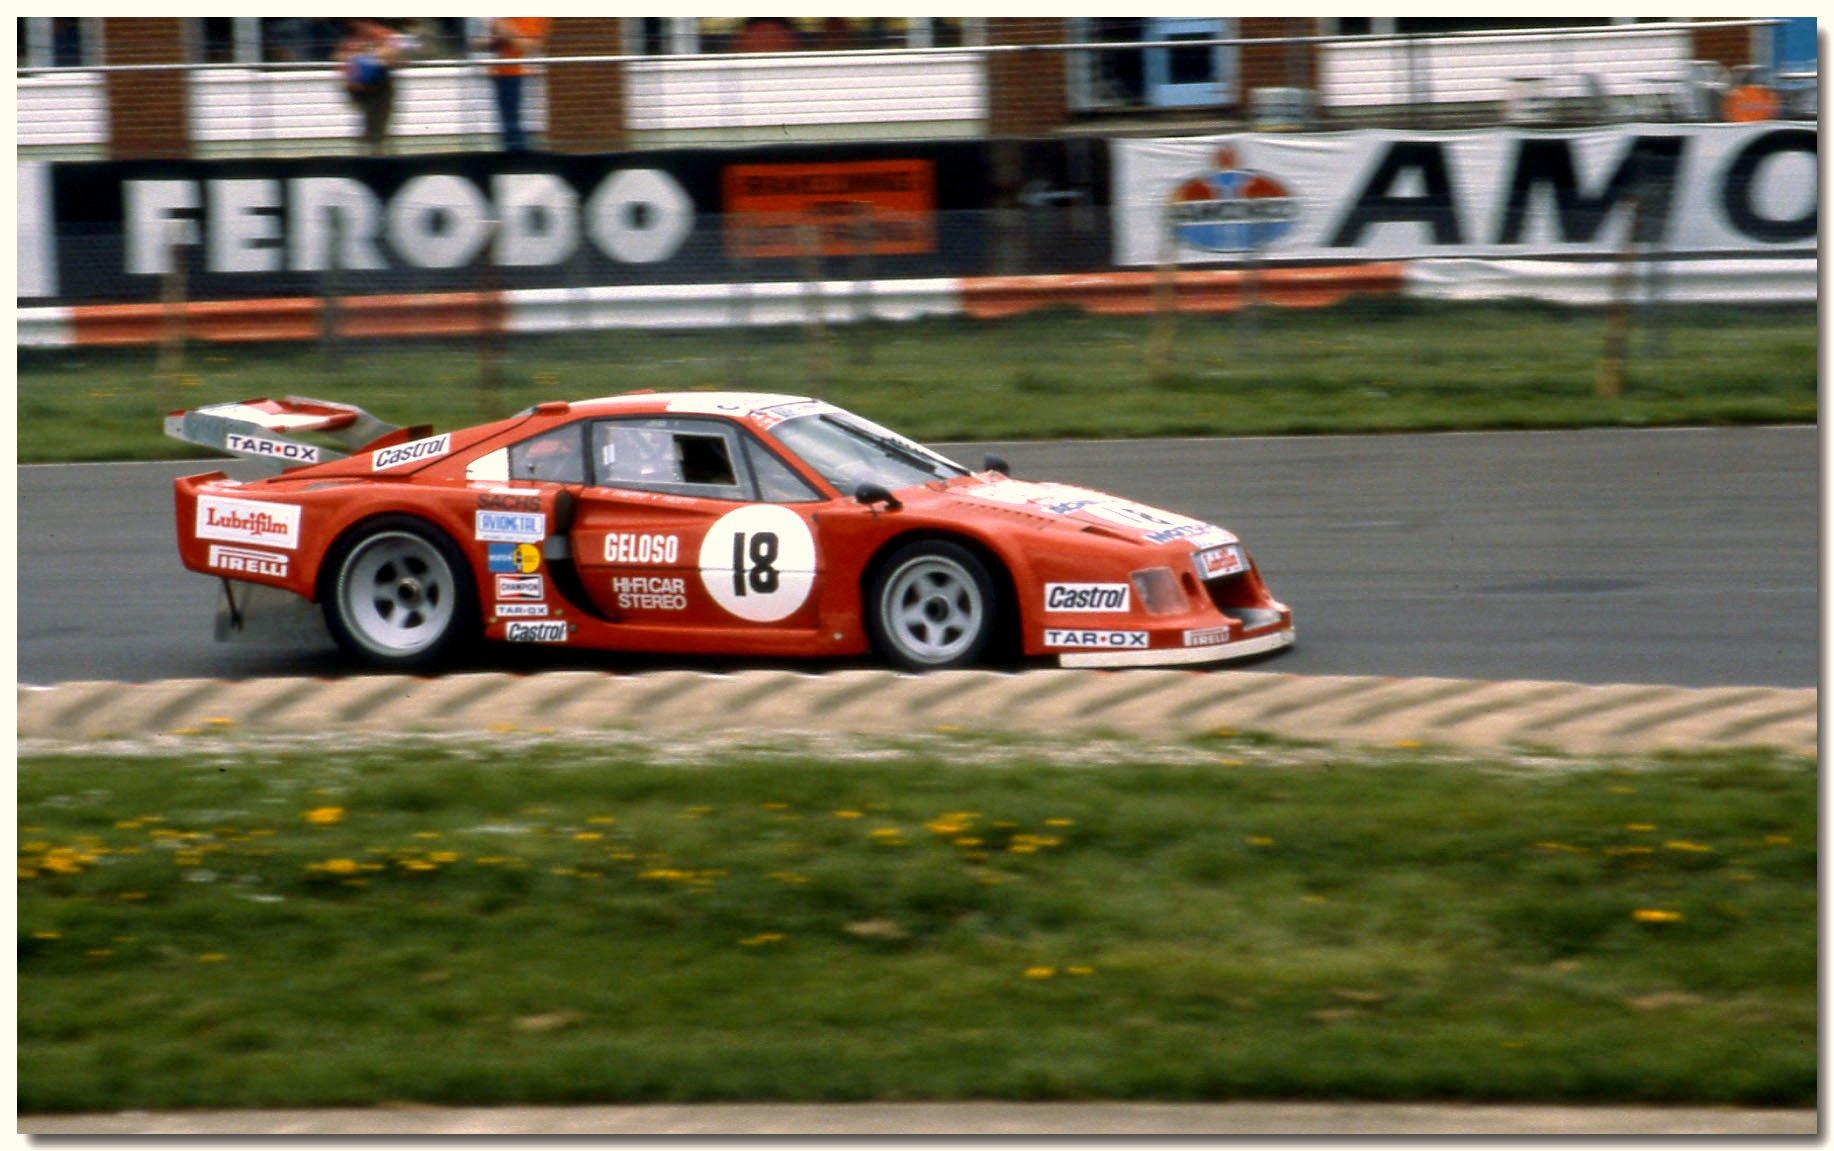 Facetti Ferrari 308 GTB